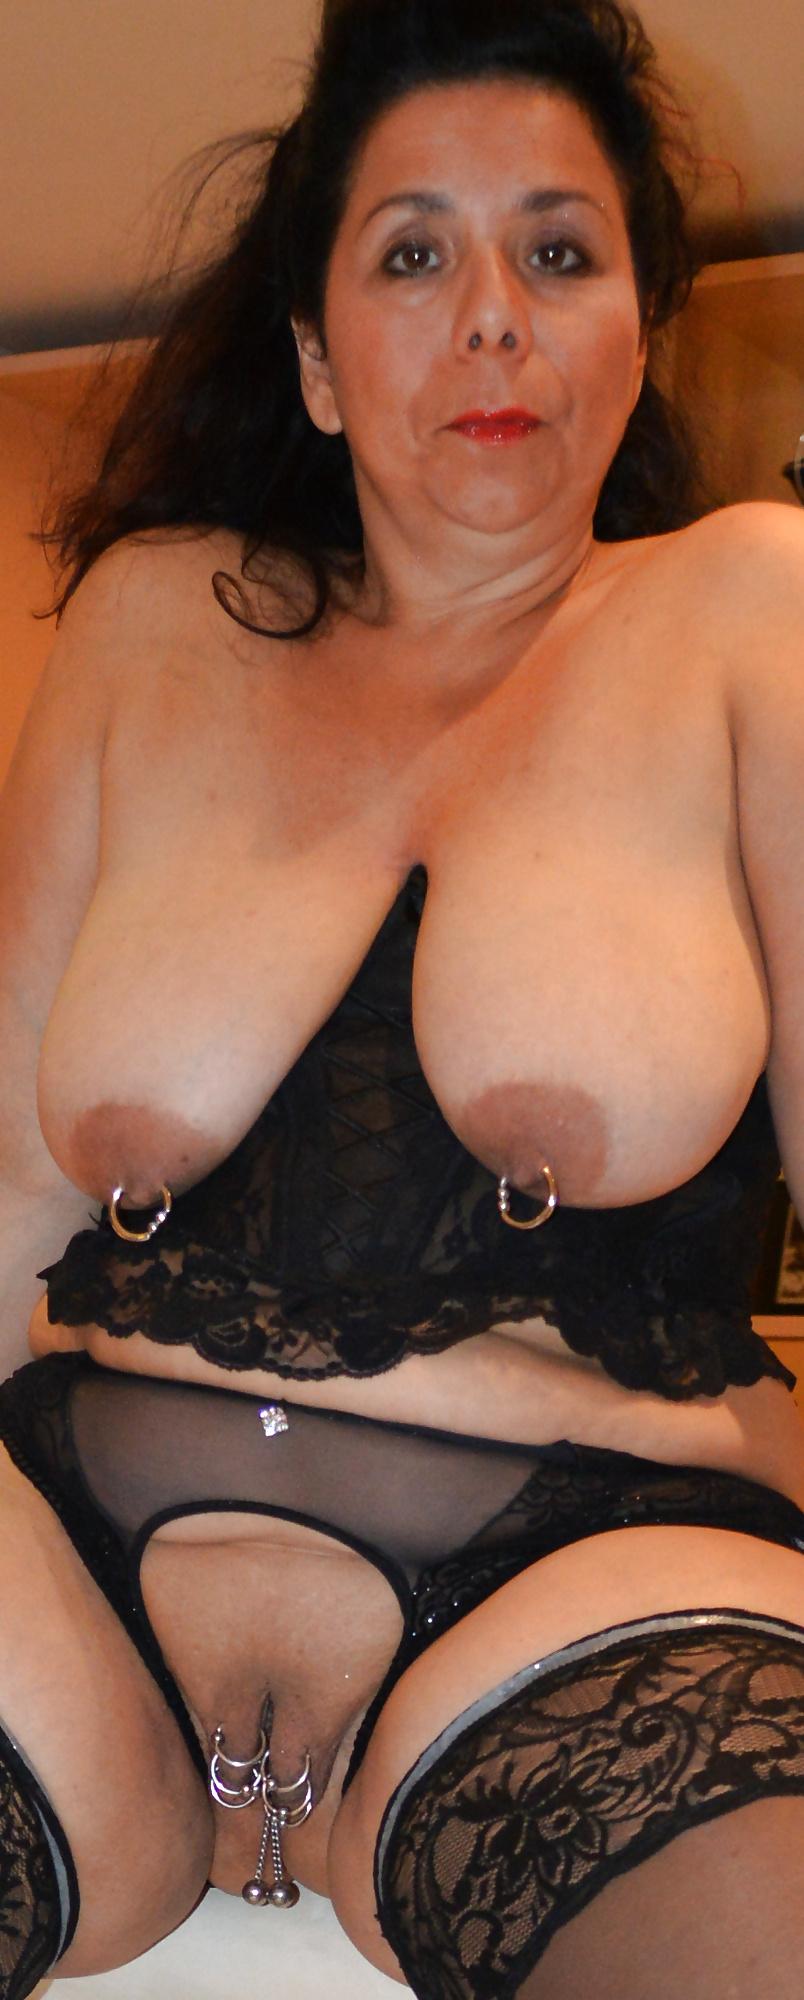 Porn tube 2020 Sex toys vibrator bbw makeout